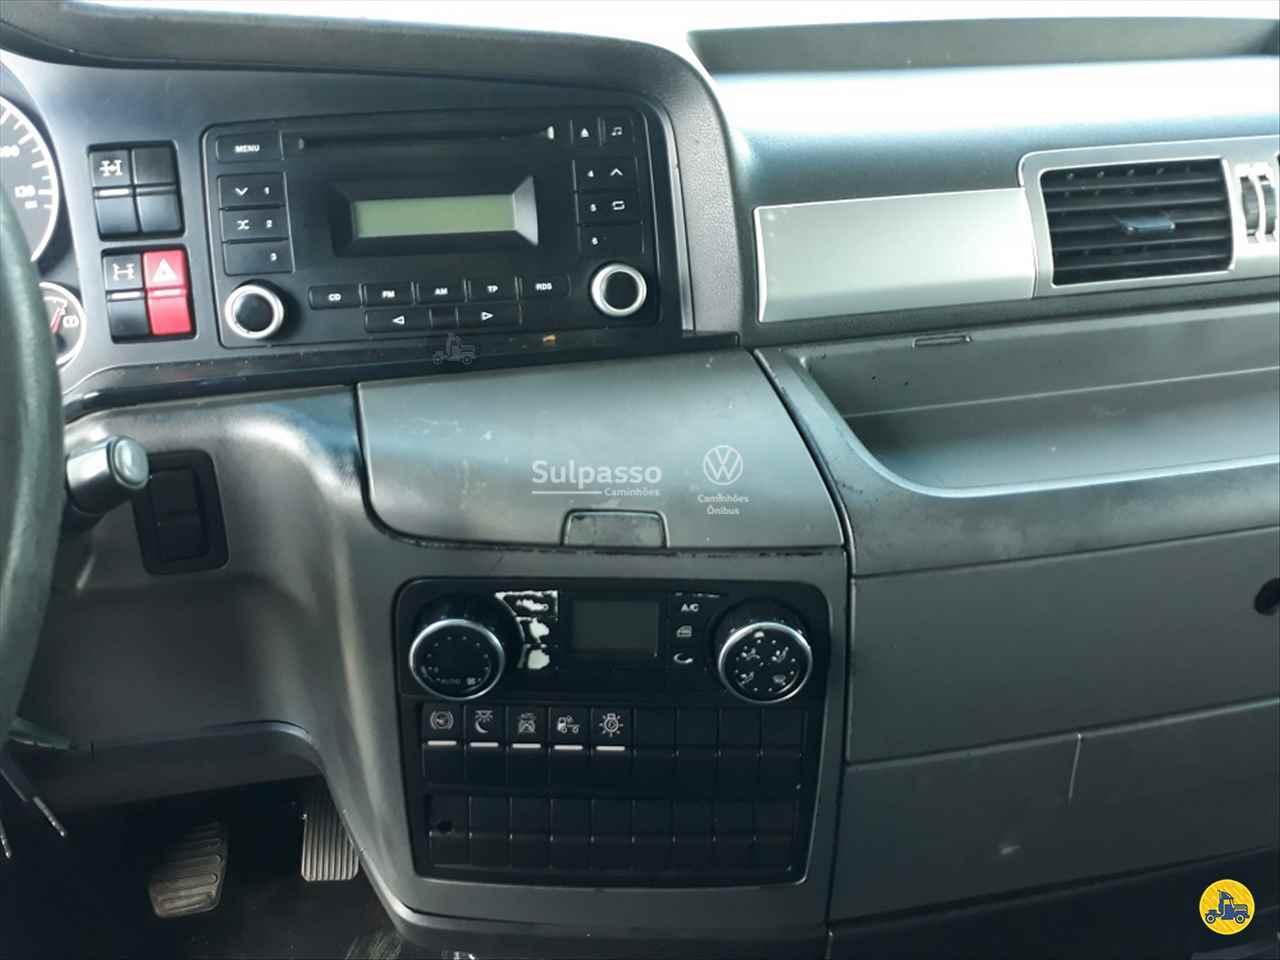 MAN TGX 29 440 340000km 2016/2017 Sulpasso Caminhões - VW MAN